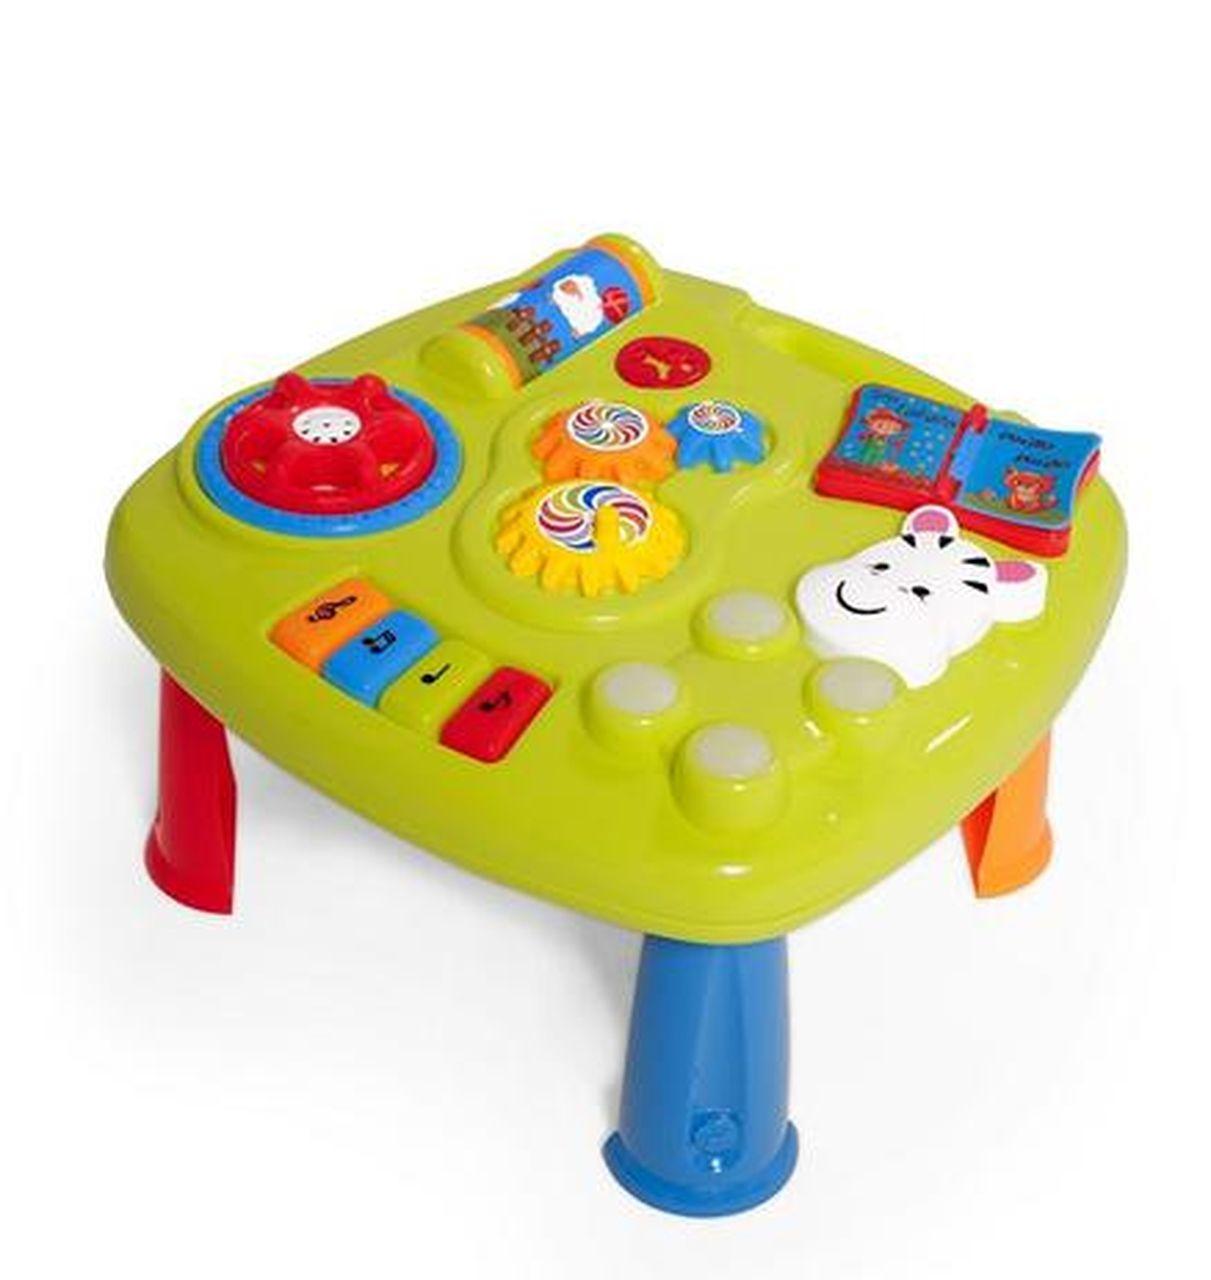 Music Table Mesinha Centro Educativo Som Atividade - Tateti